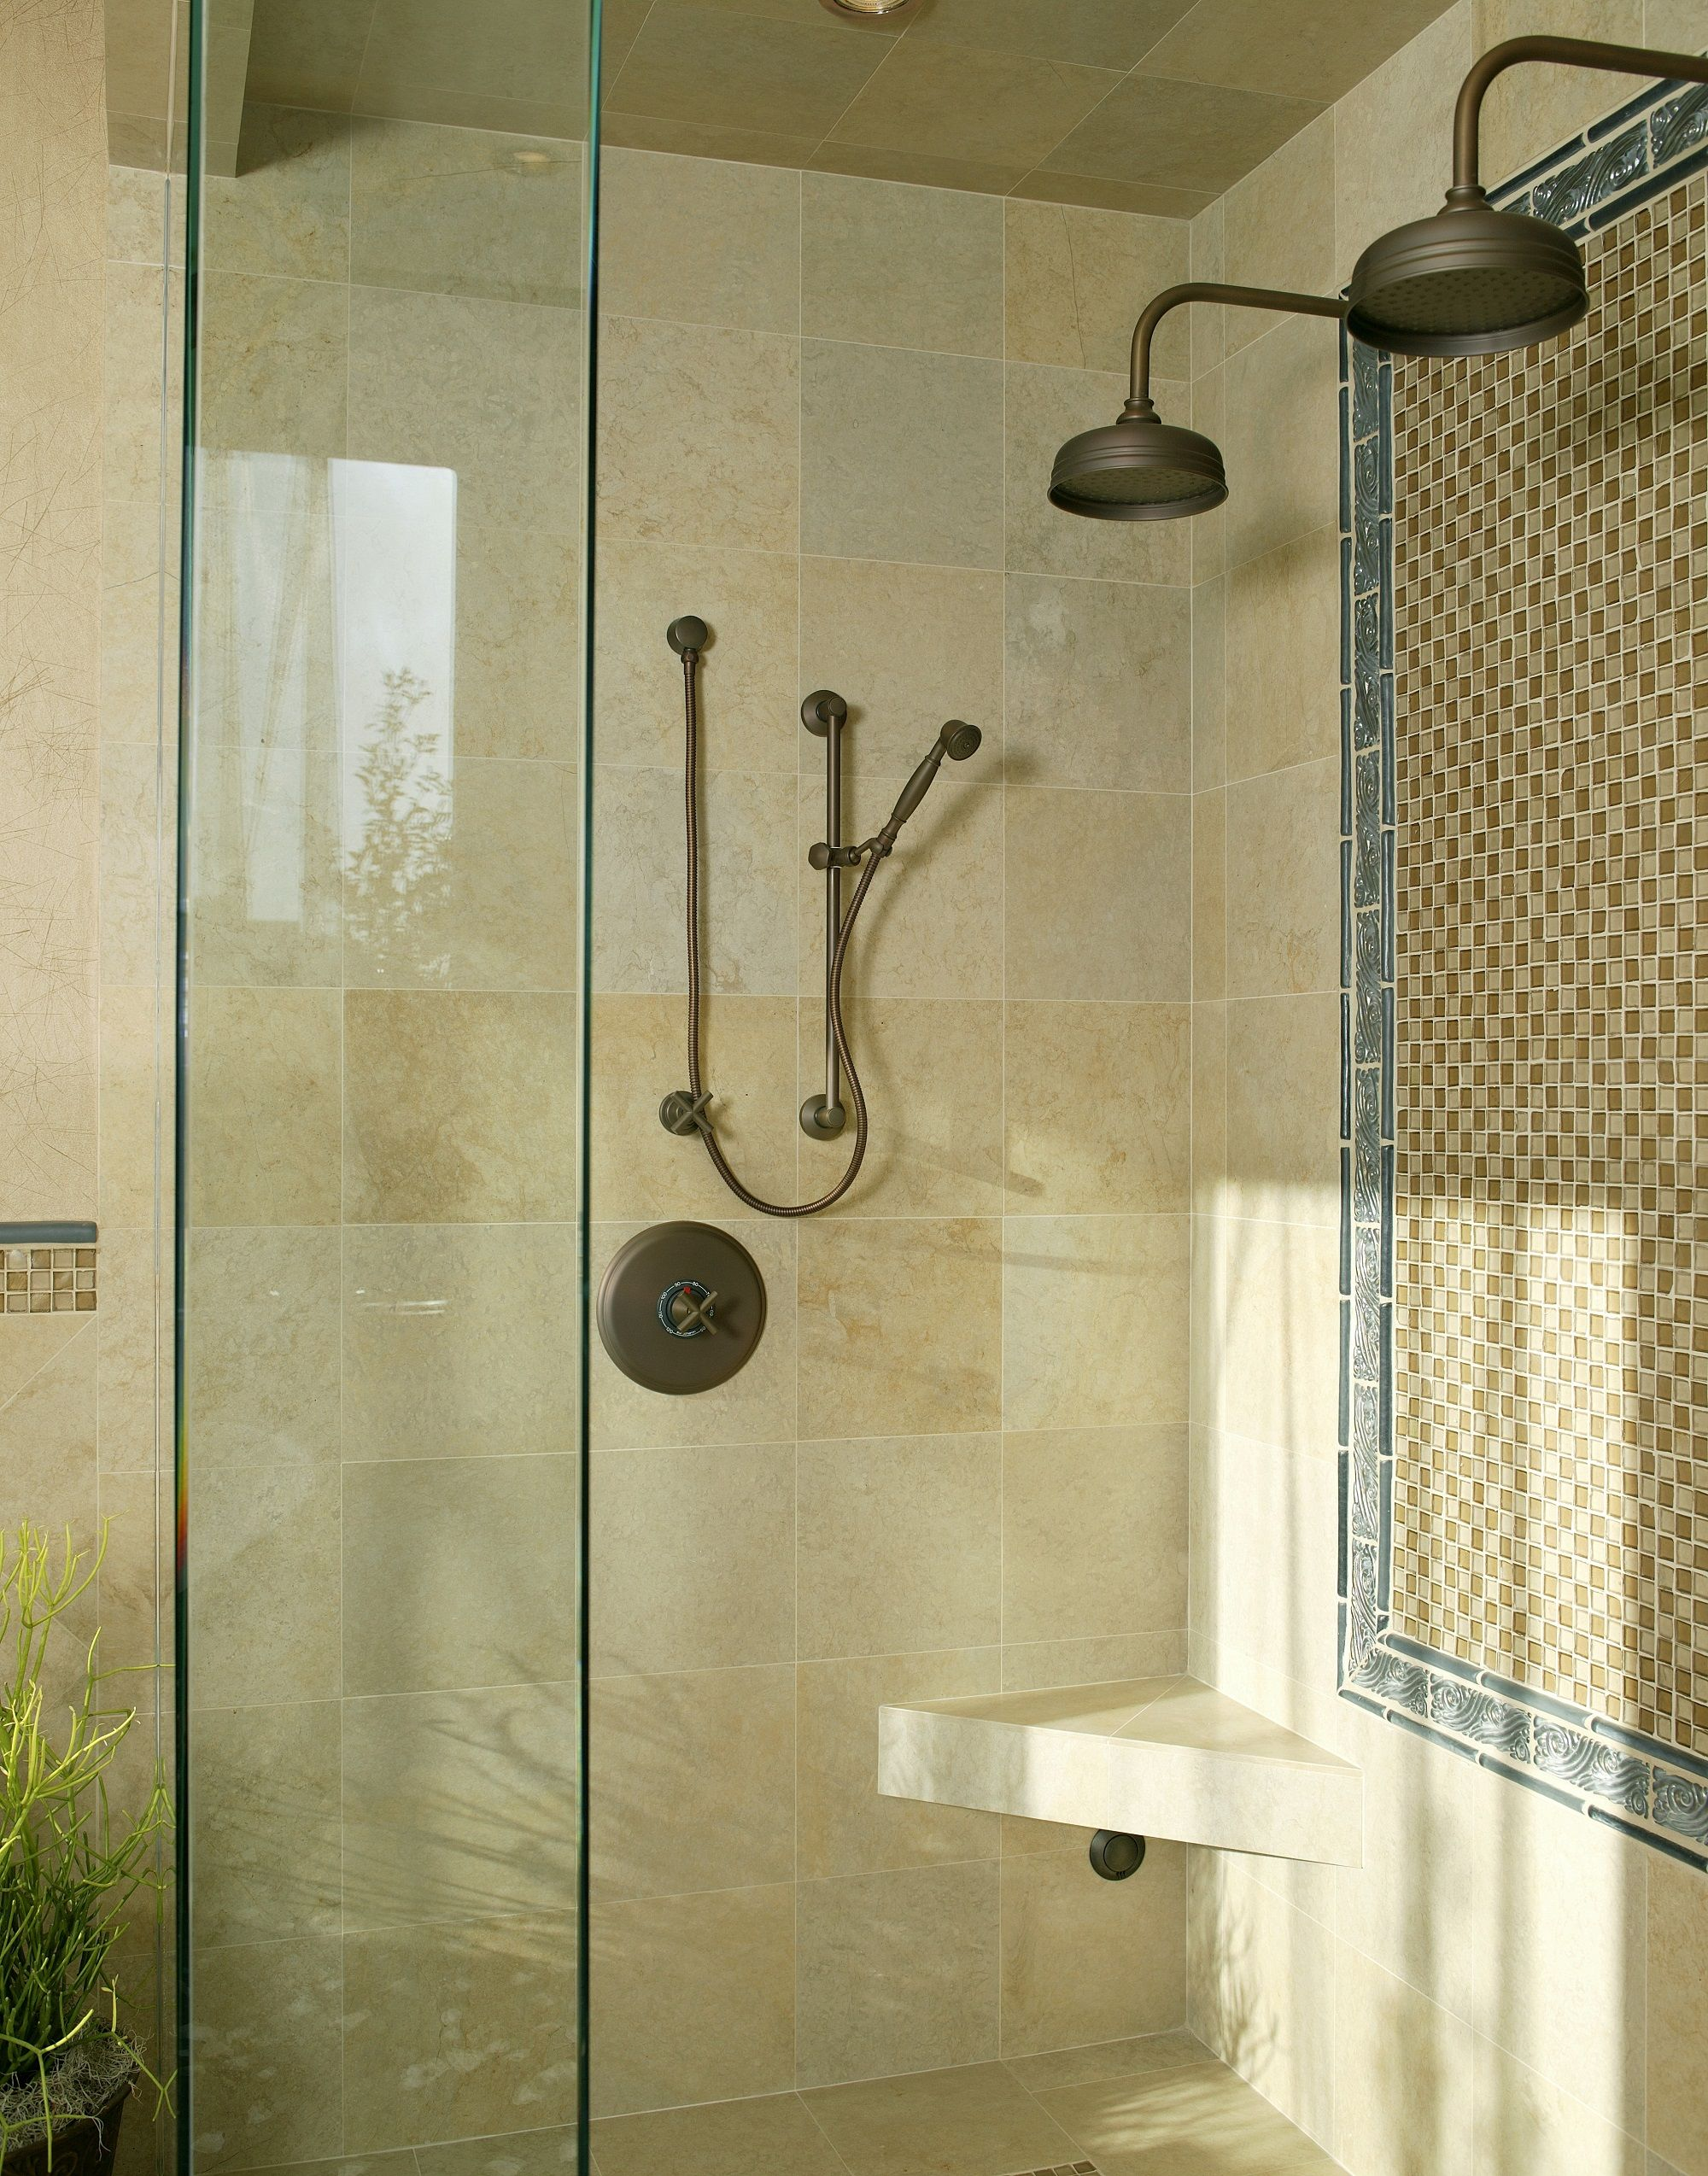 Shower Installation Cost Guide Shower Doors Tiles Pumps Etc Glass Shower Wall Shower Wall Panels Shower Wall